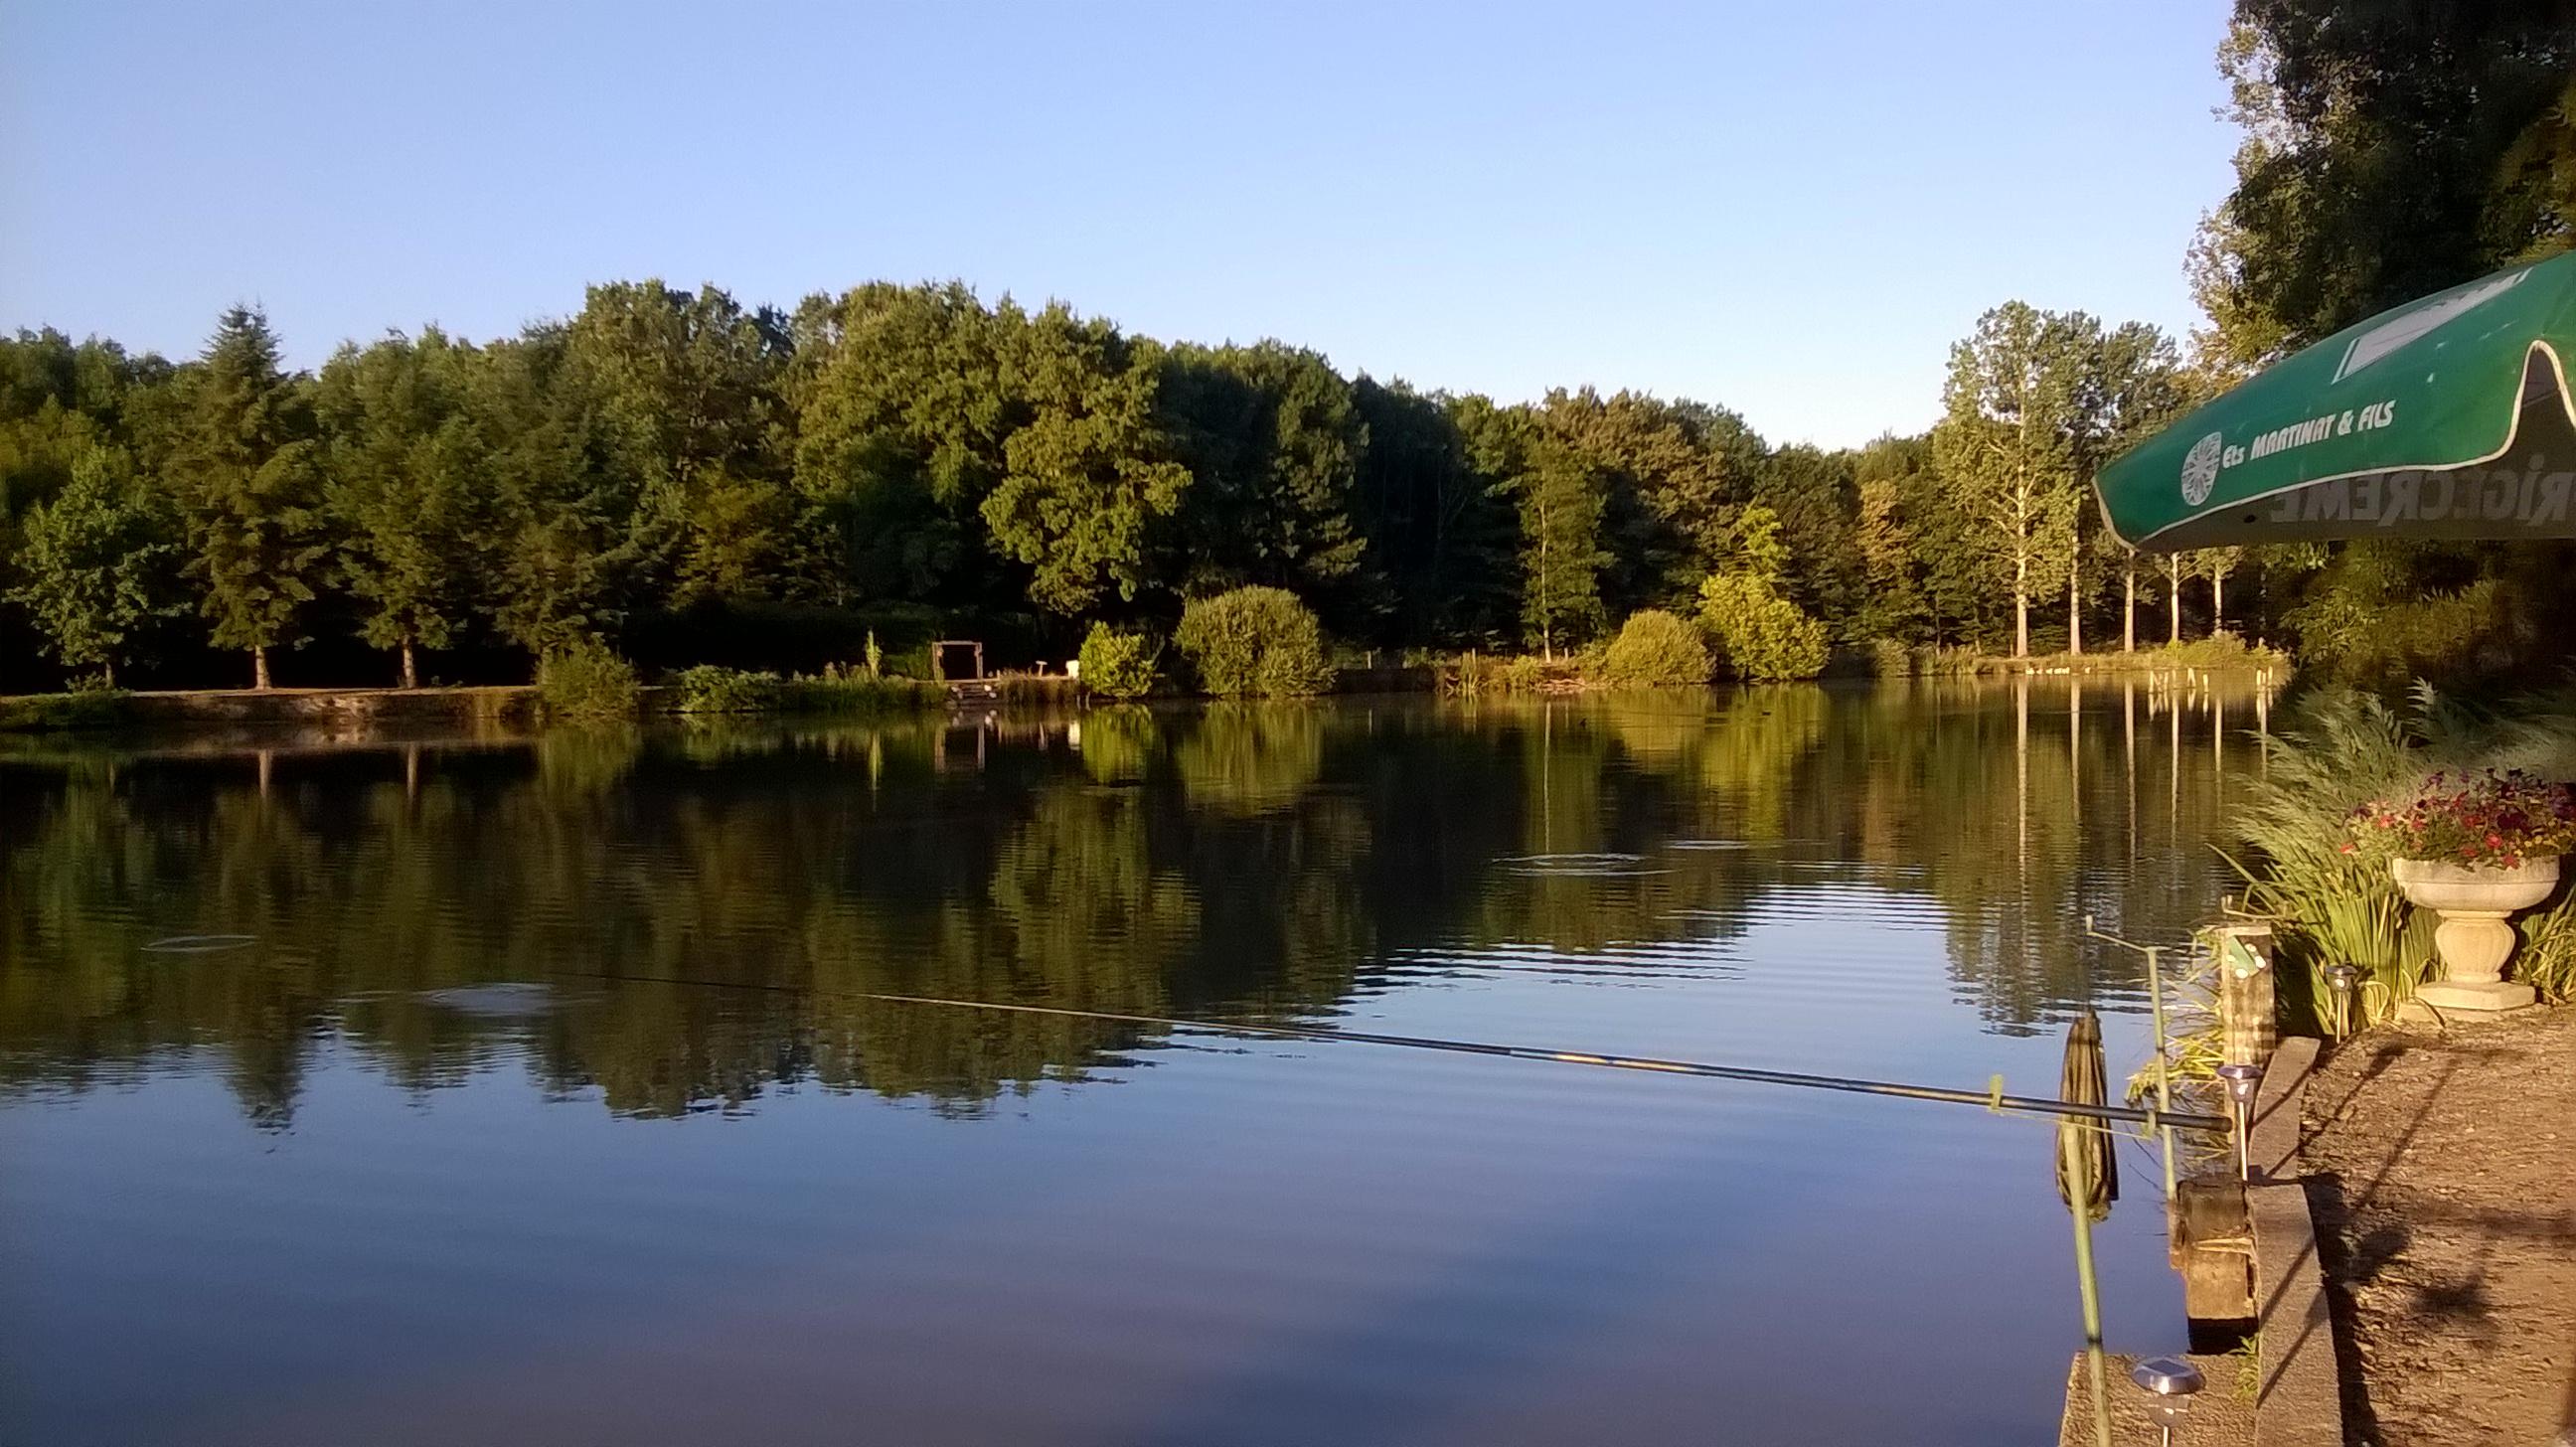 Chalet pêcher la carpe en France